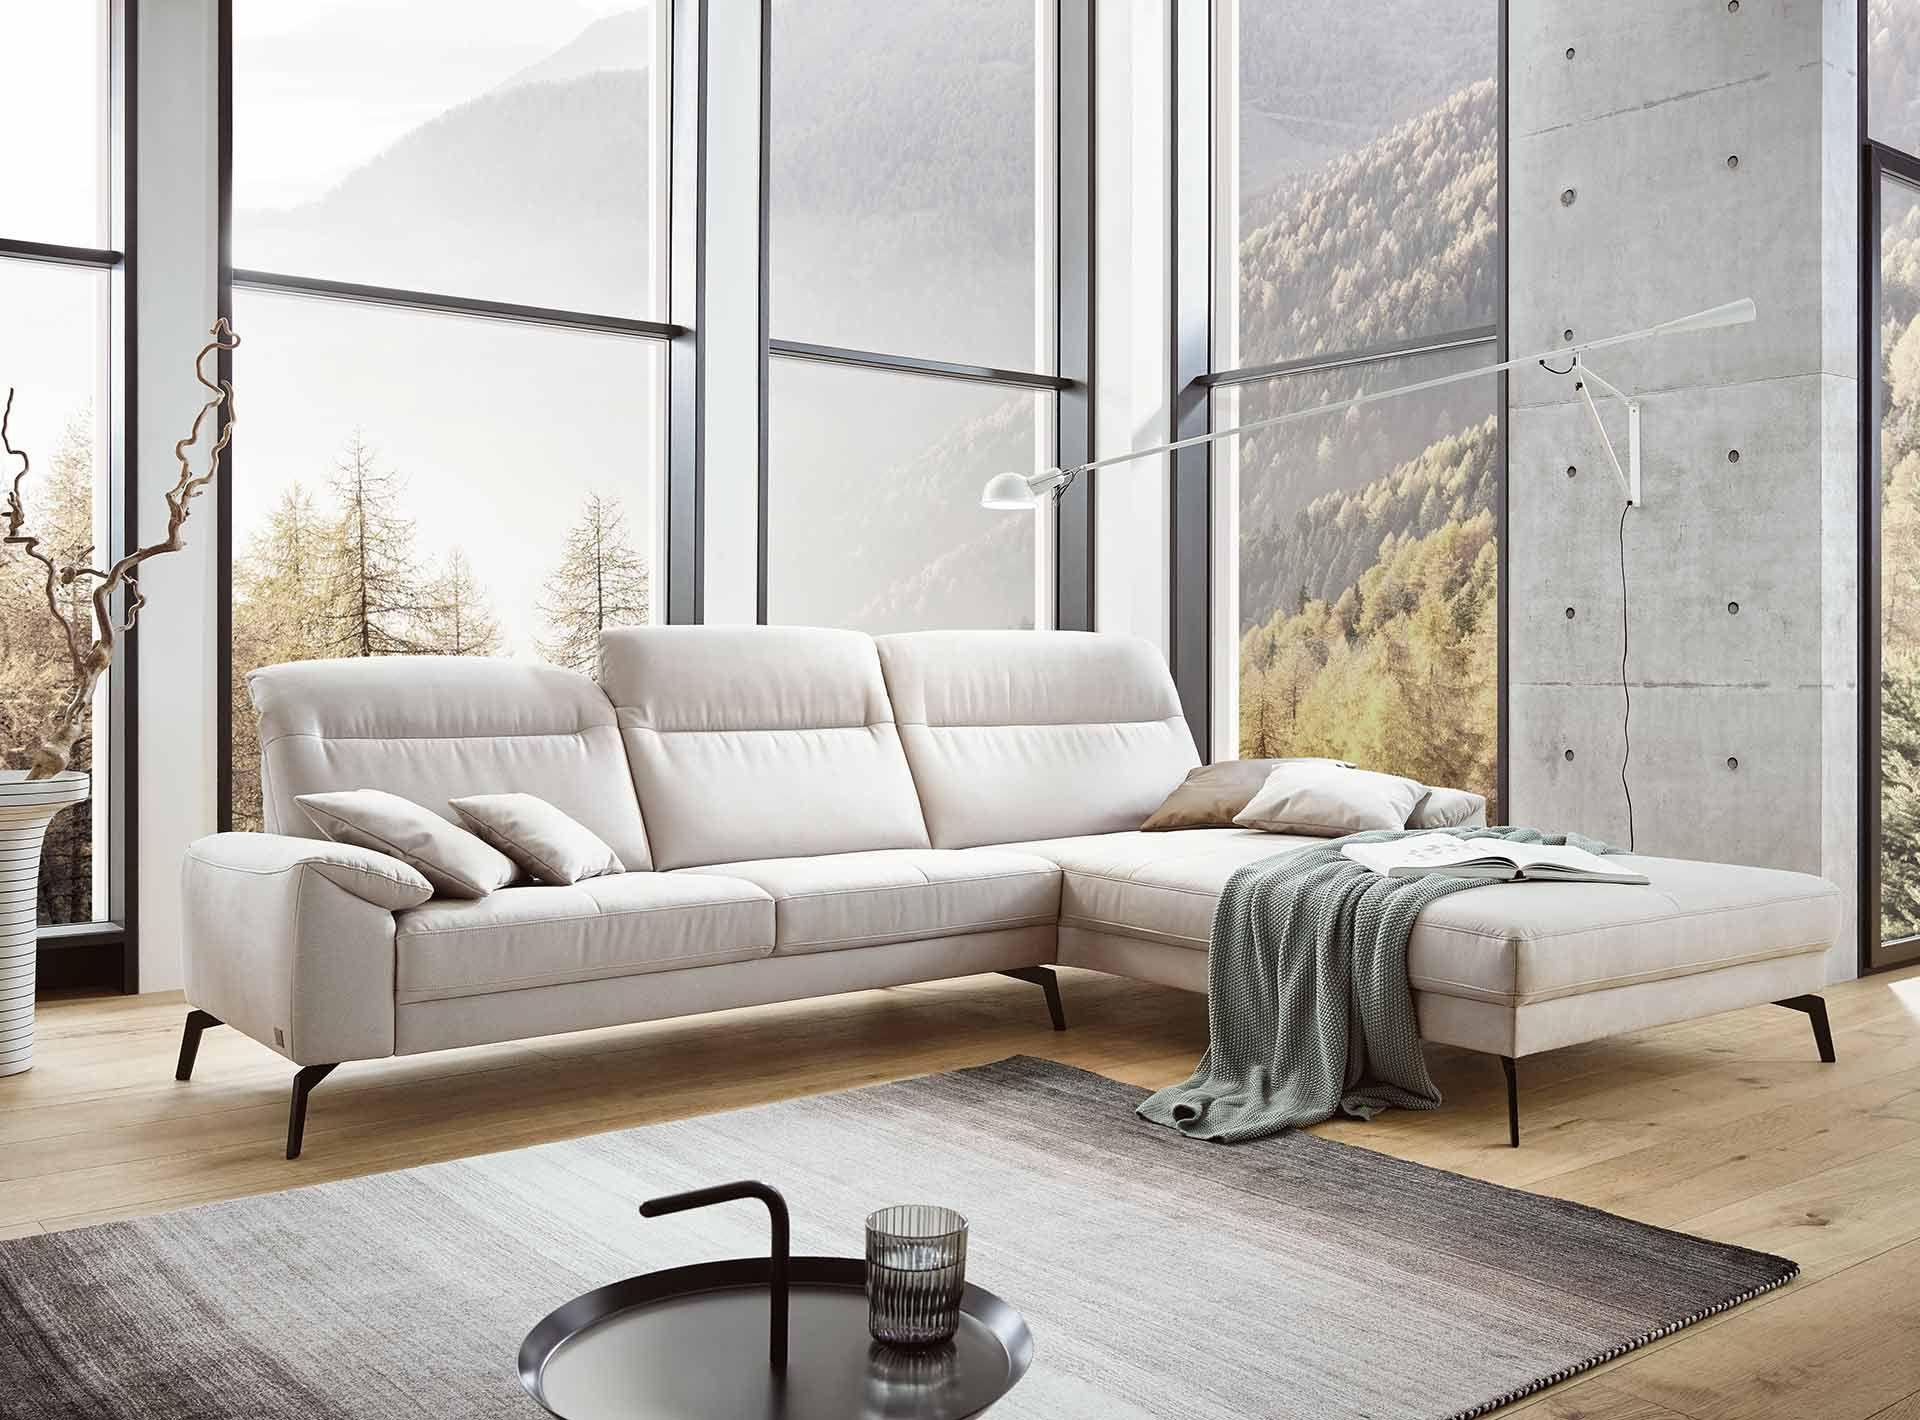 Individuelles Sofa planen   Sofa, Haus deko, Modernes ...